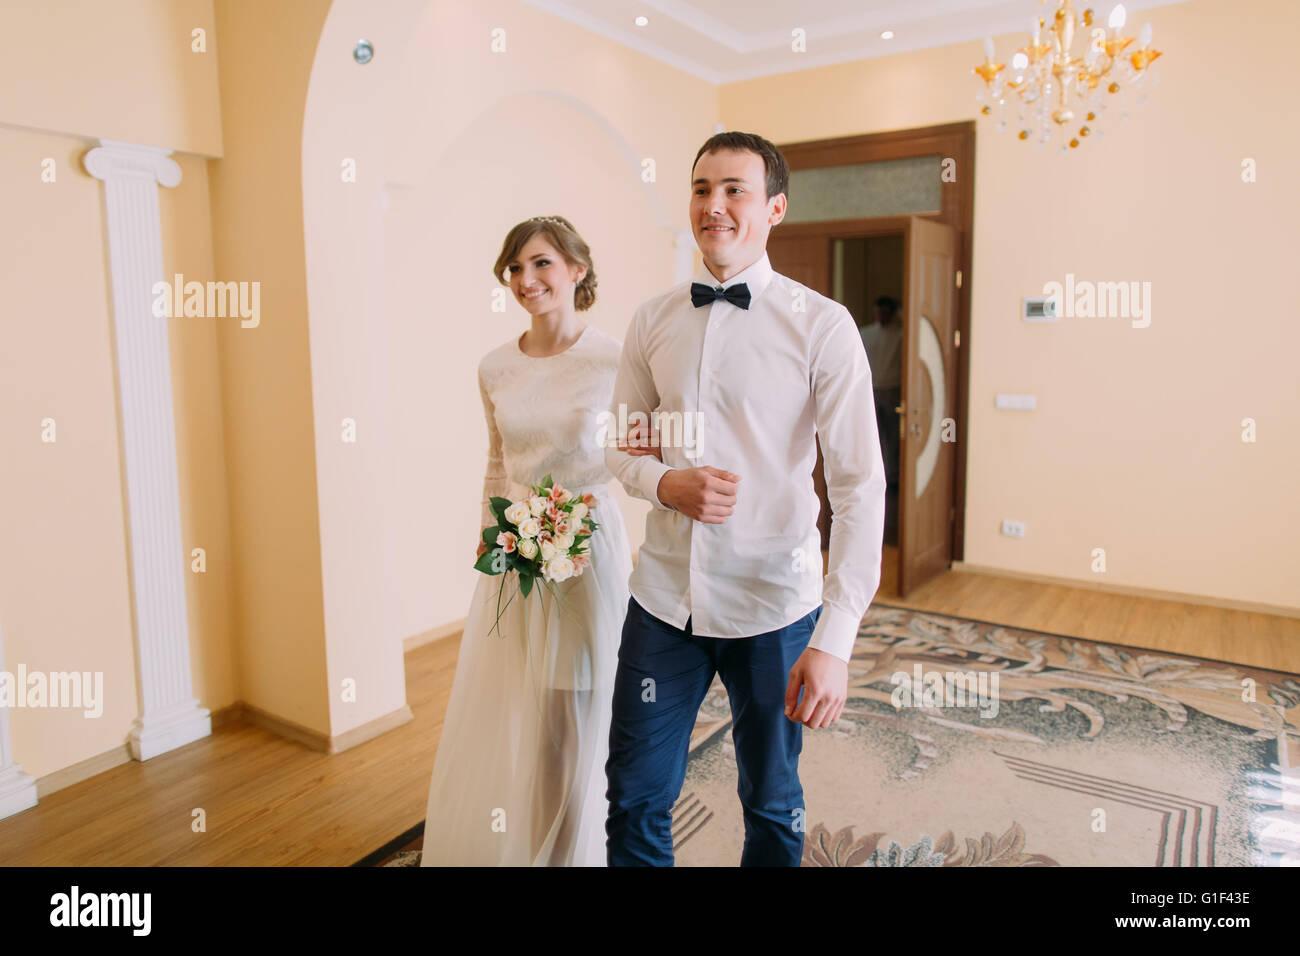 Happy groom and bride walking hand-in-hand at civil registry office ...